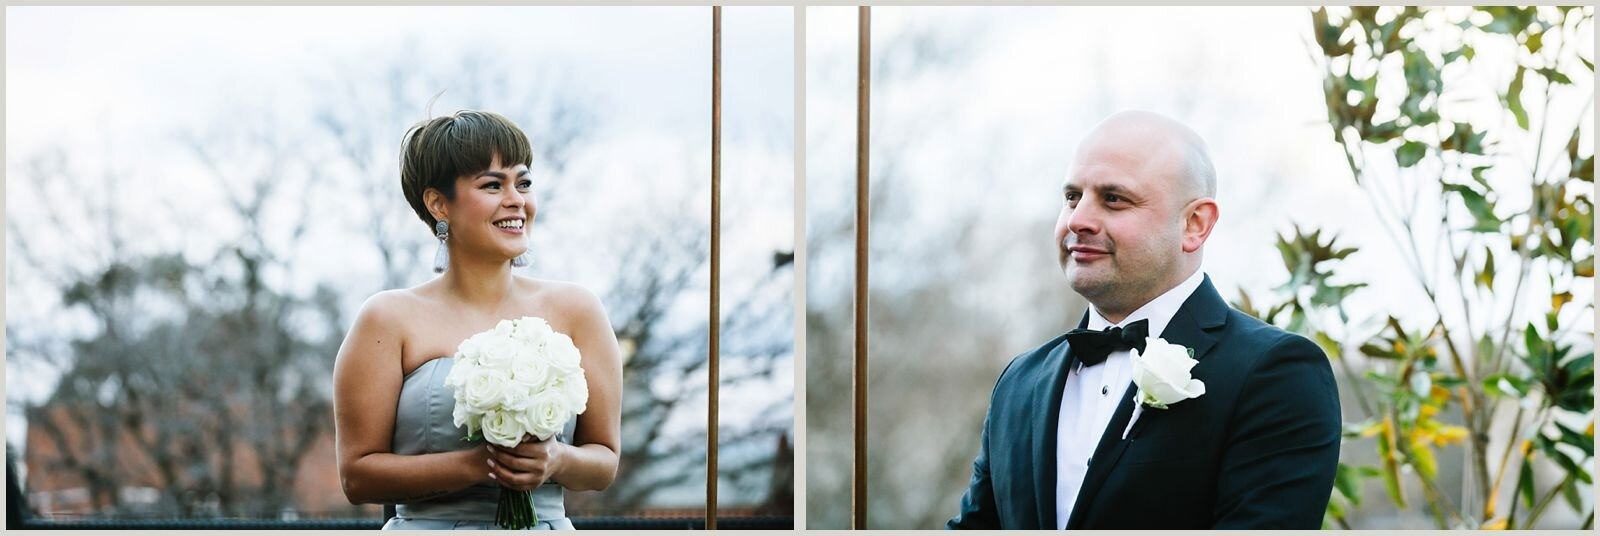 joseph_koprek_wedding_melbourne_the_prince_deck_0055.jpg